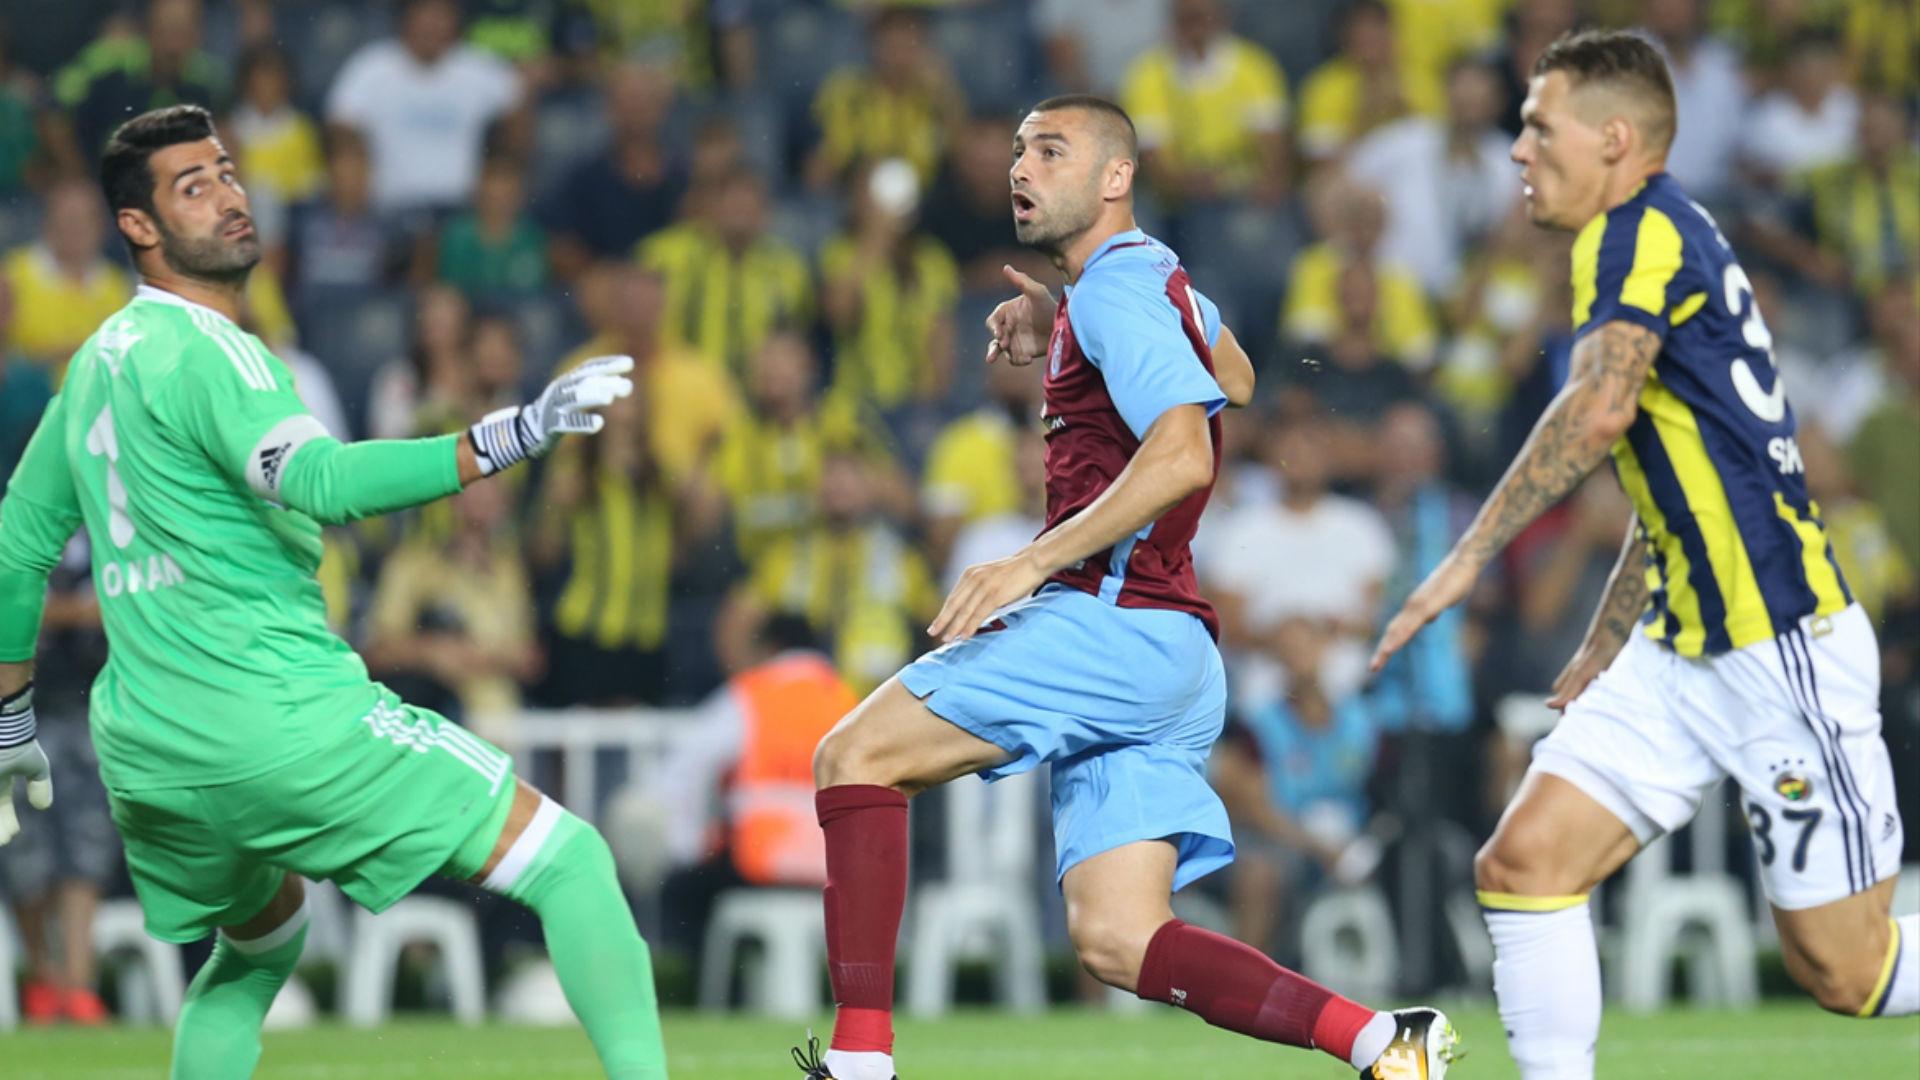 Burak Yilmaz Volkan Demirel Fenerbahce Trabzonspor 08202017